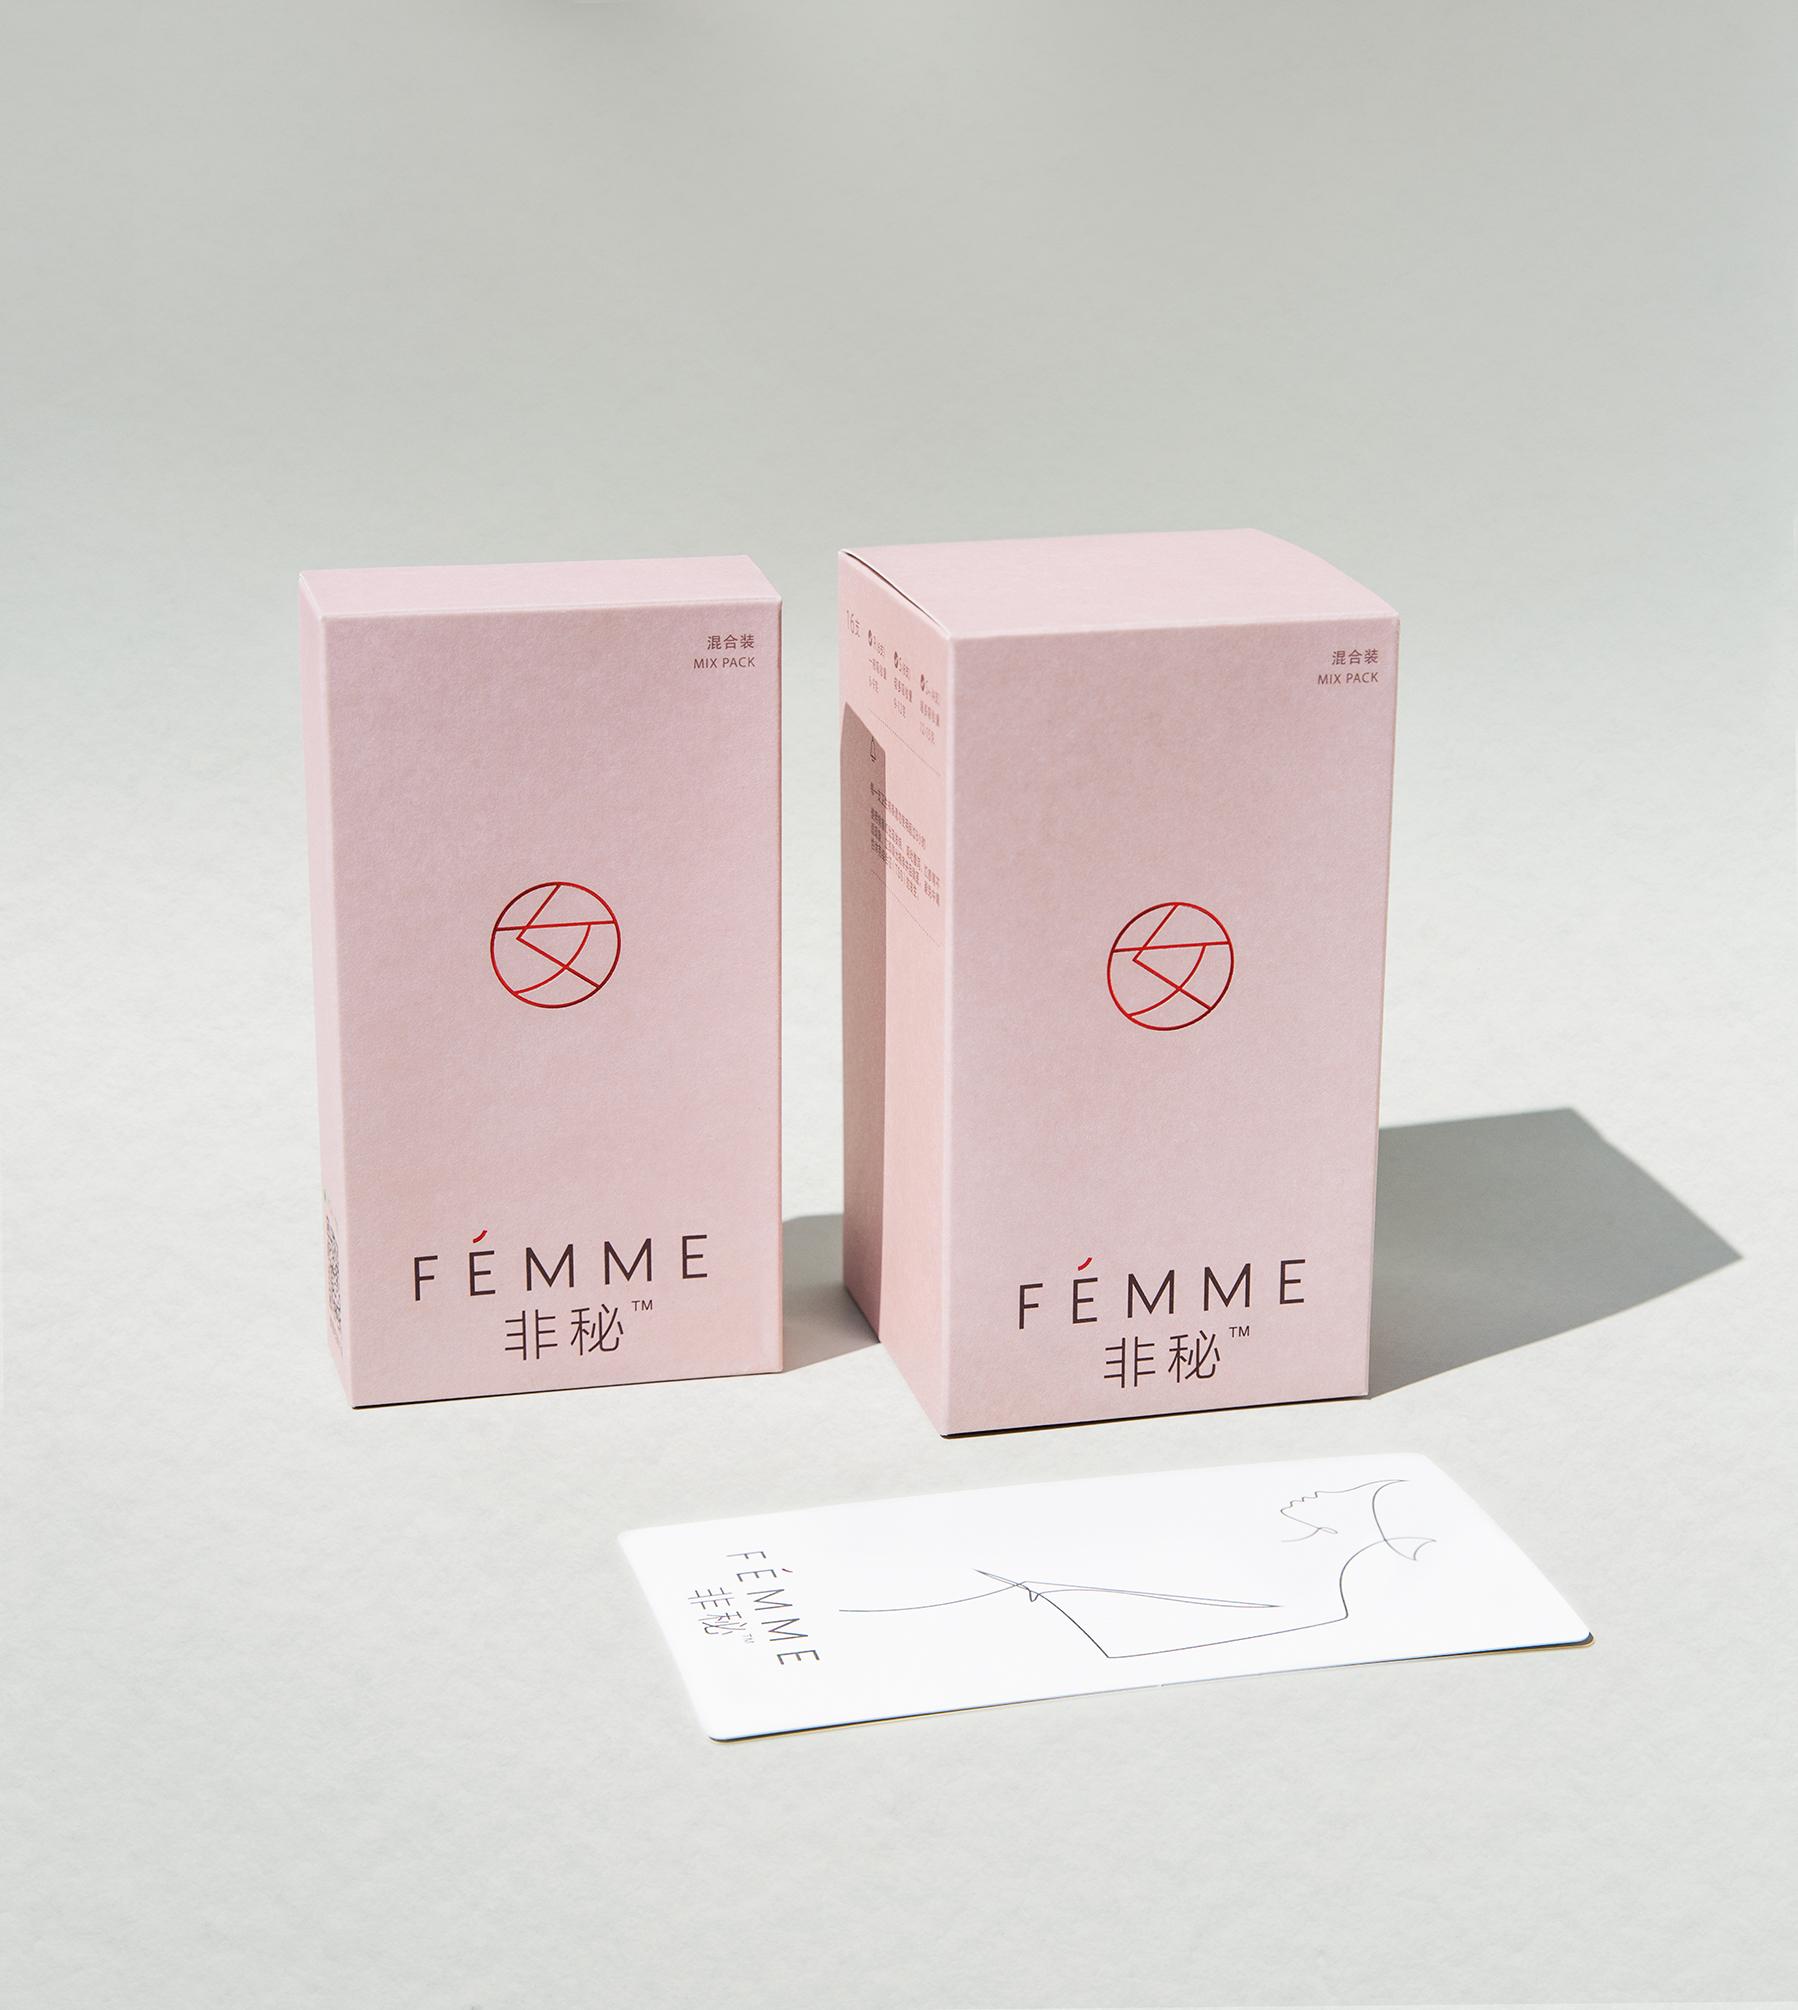 Femme_01